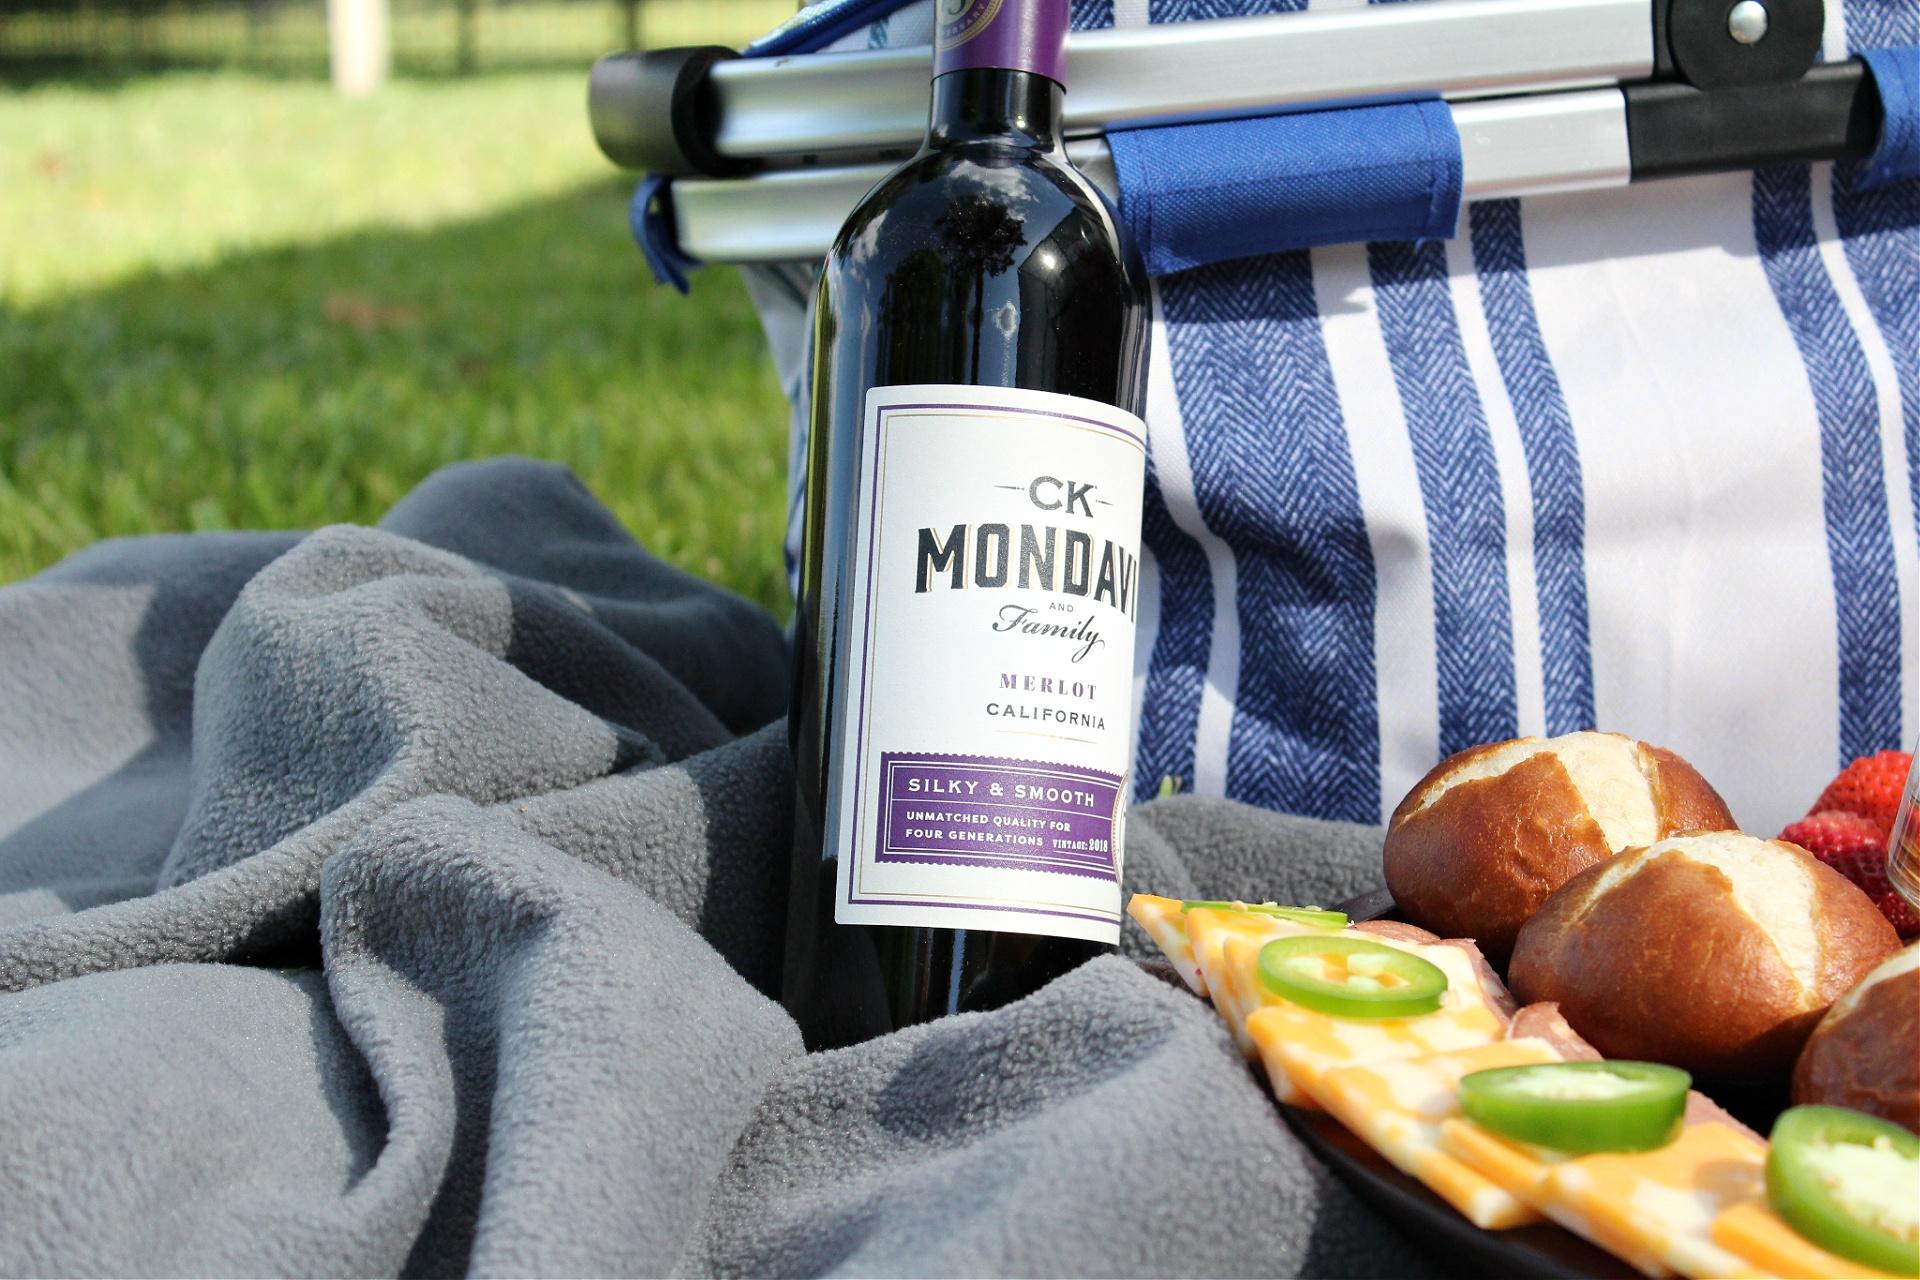 Best Spring Wines For Under $15